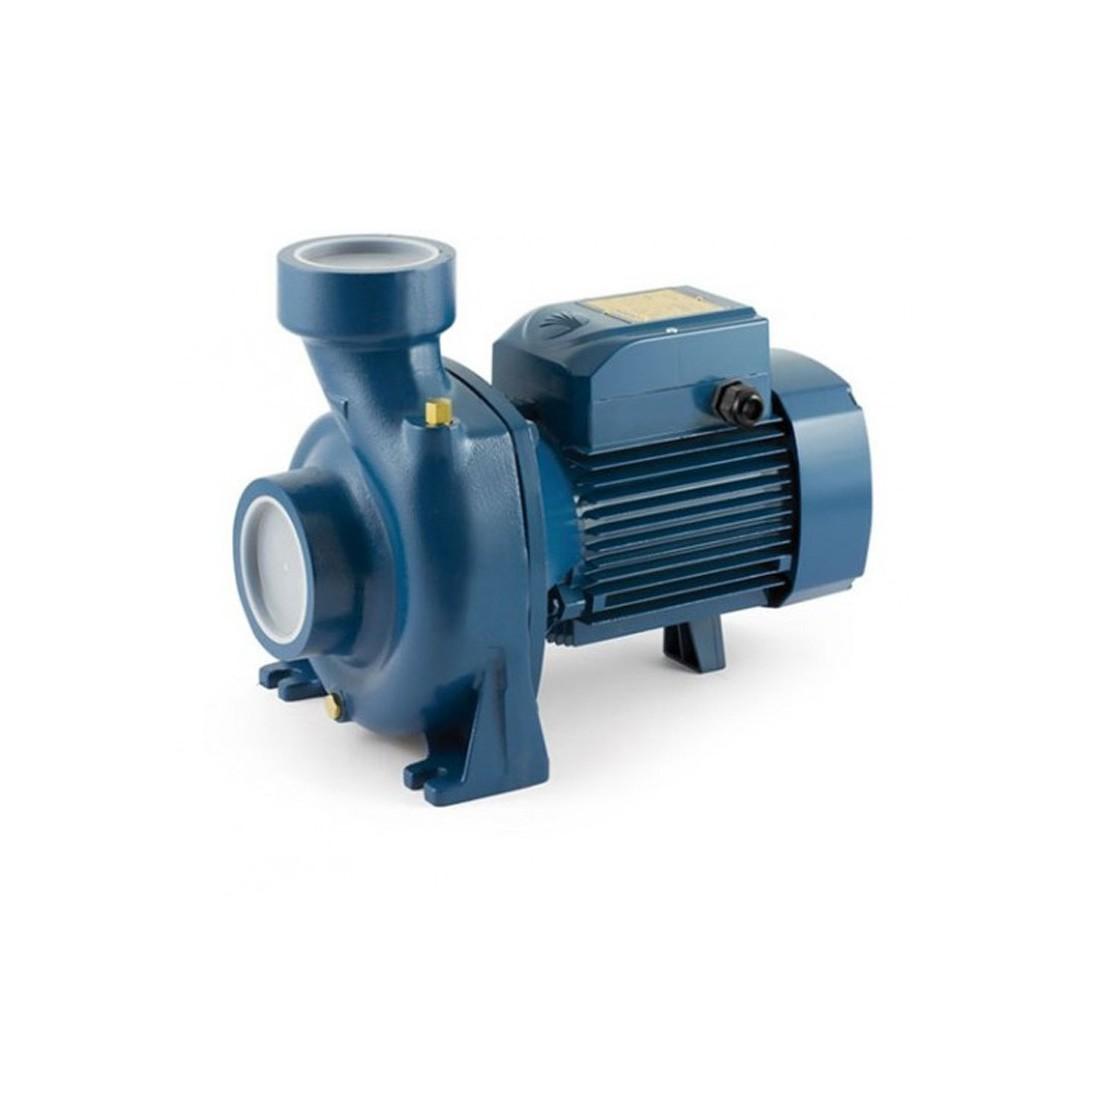 Pompa de suprafata centrifugala Pedrollo HFm 5A monofazata